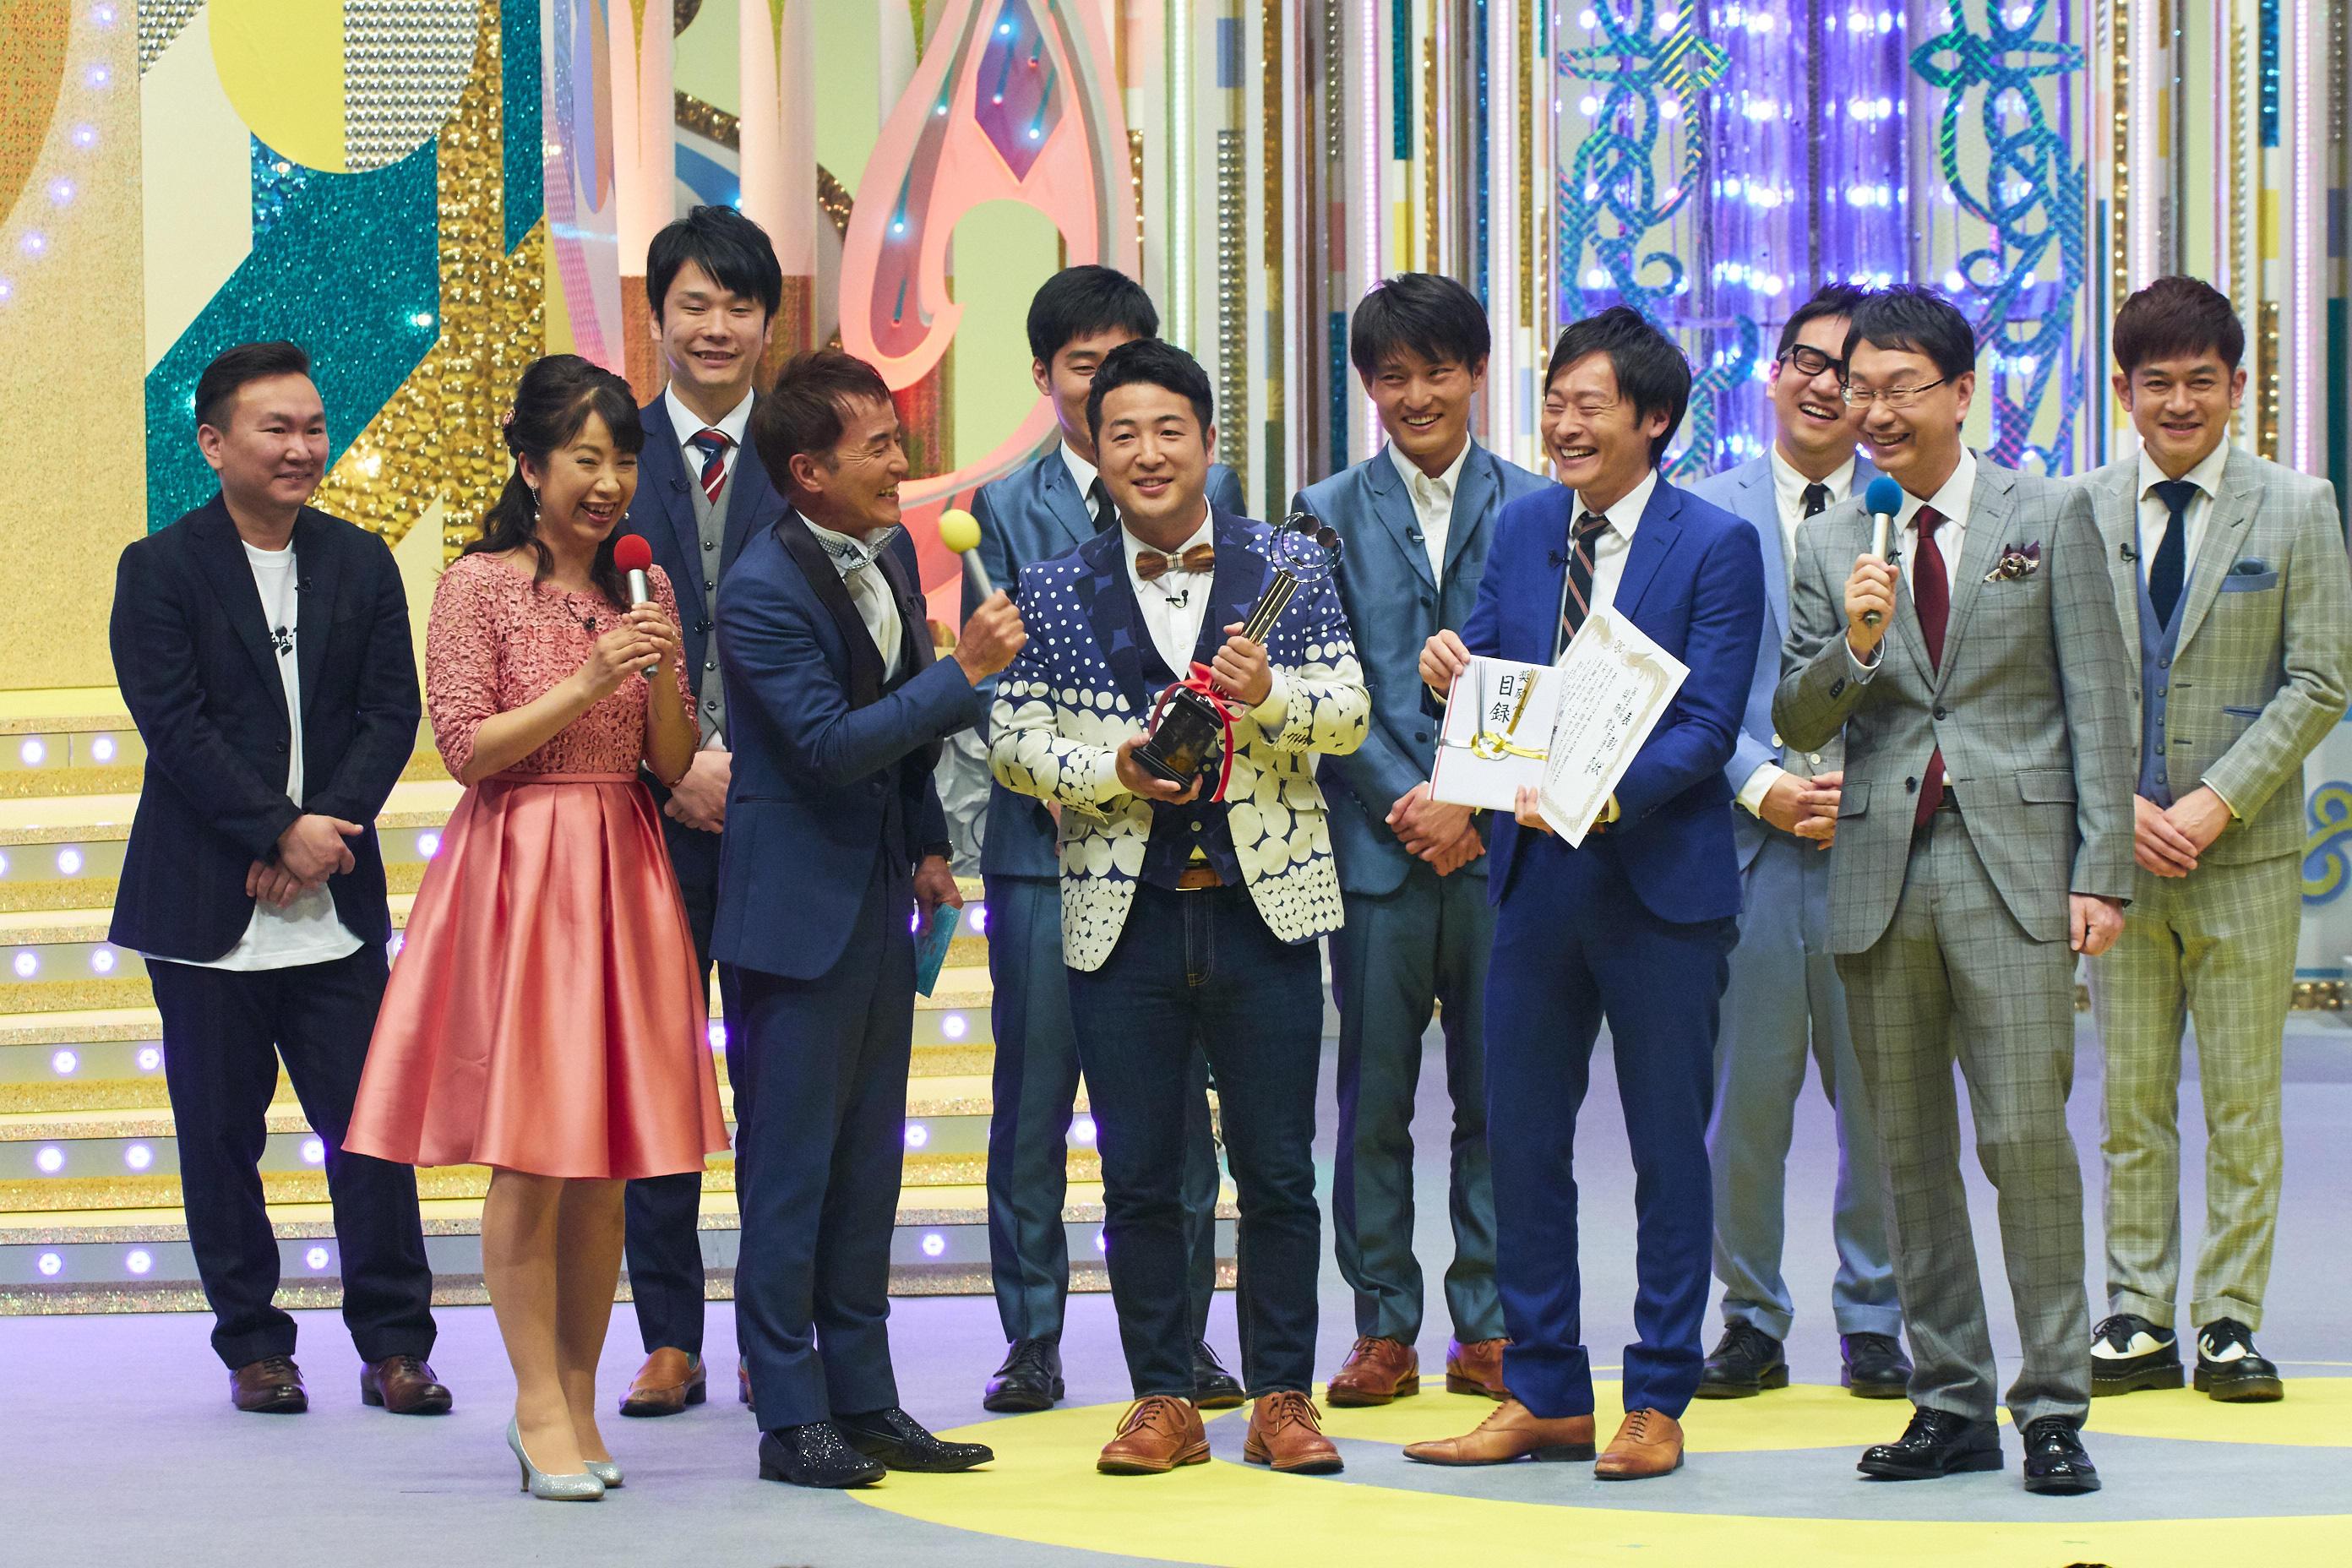 http://news.yoshimoto.co.jp/20180409143339-26a10263c12daefcd260ae1774afc9d650837ad9.jpg